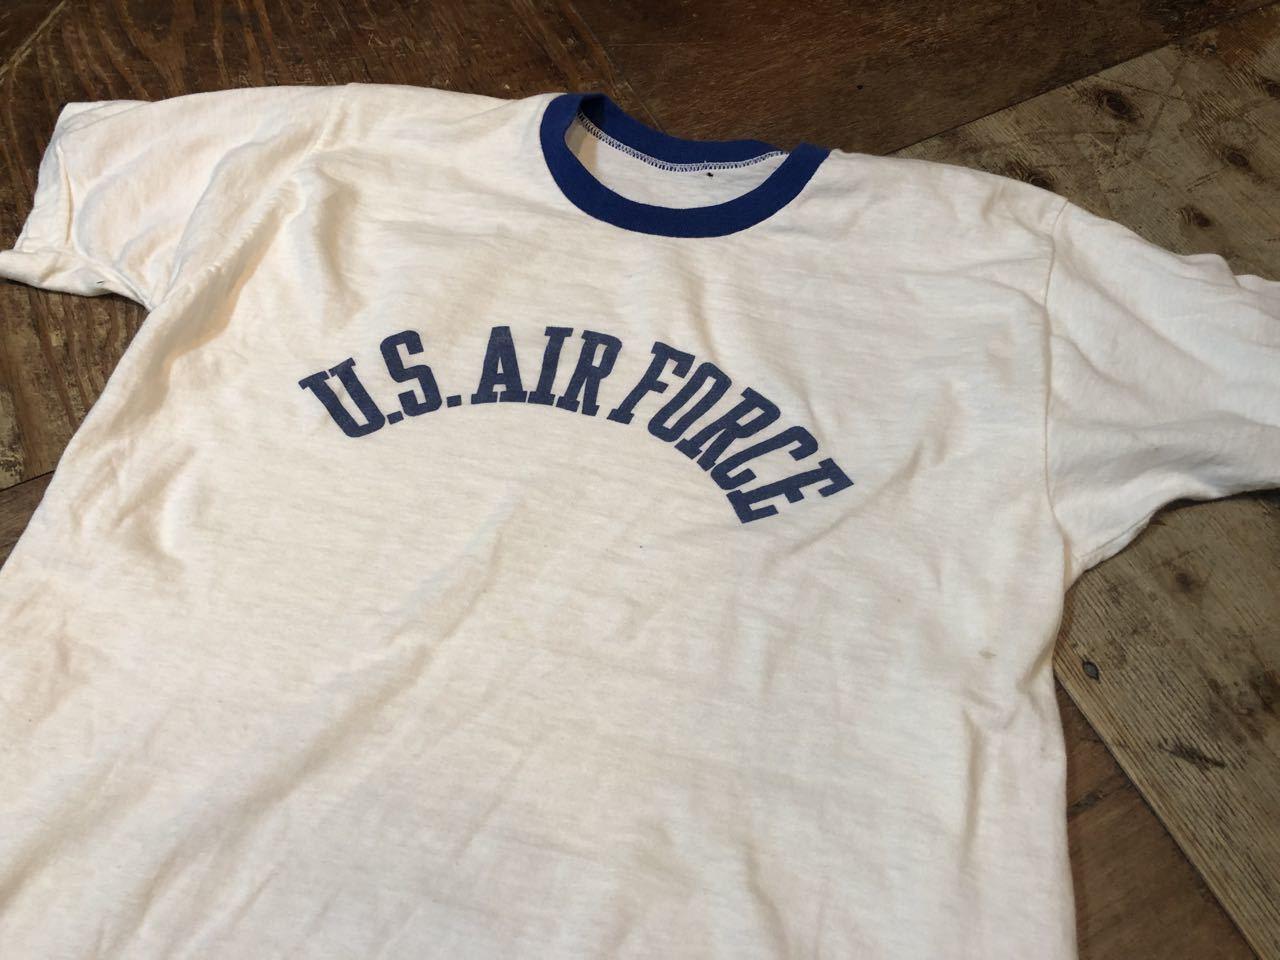 5月18日(土)入荷! 70s  U.S.A.F  all cotton 染み込み Tシャツ!_c0144020_13360420.jpg